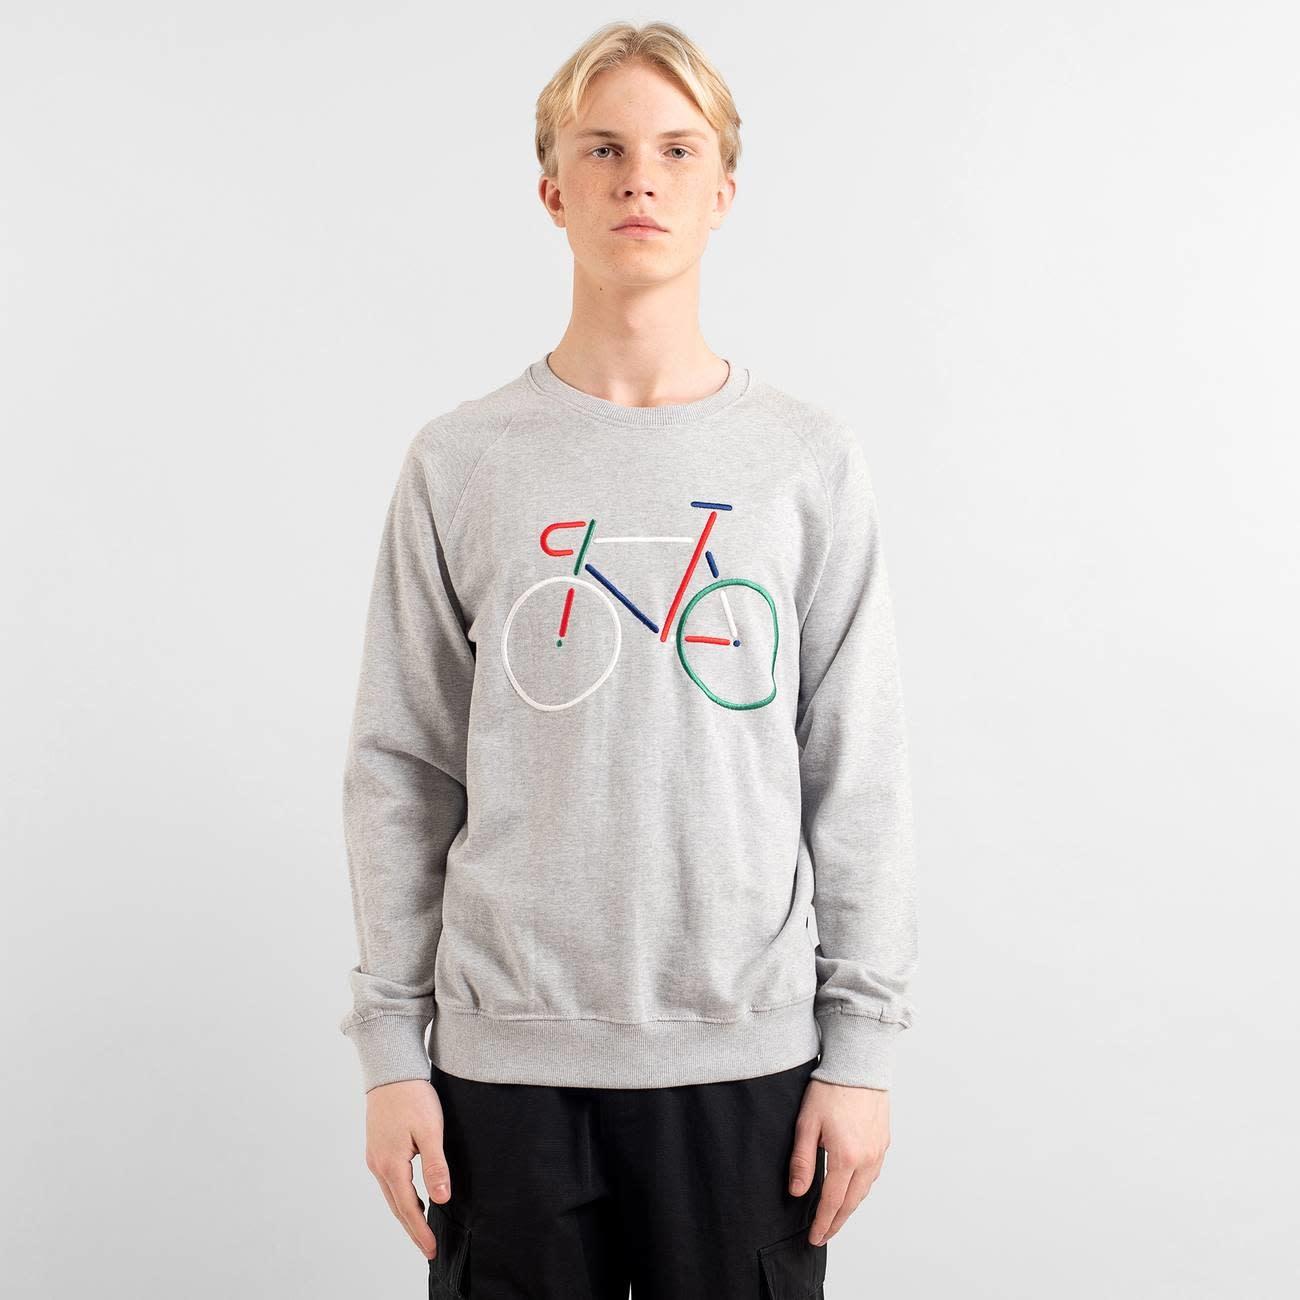 Dedicated Dedicated Malmoe Colour Bike Sweater Grey